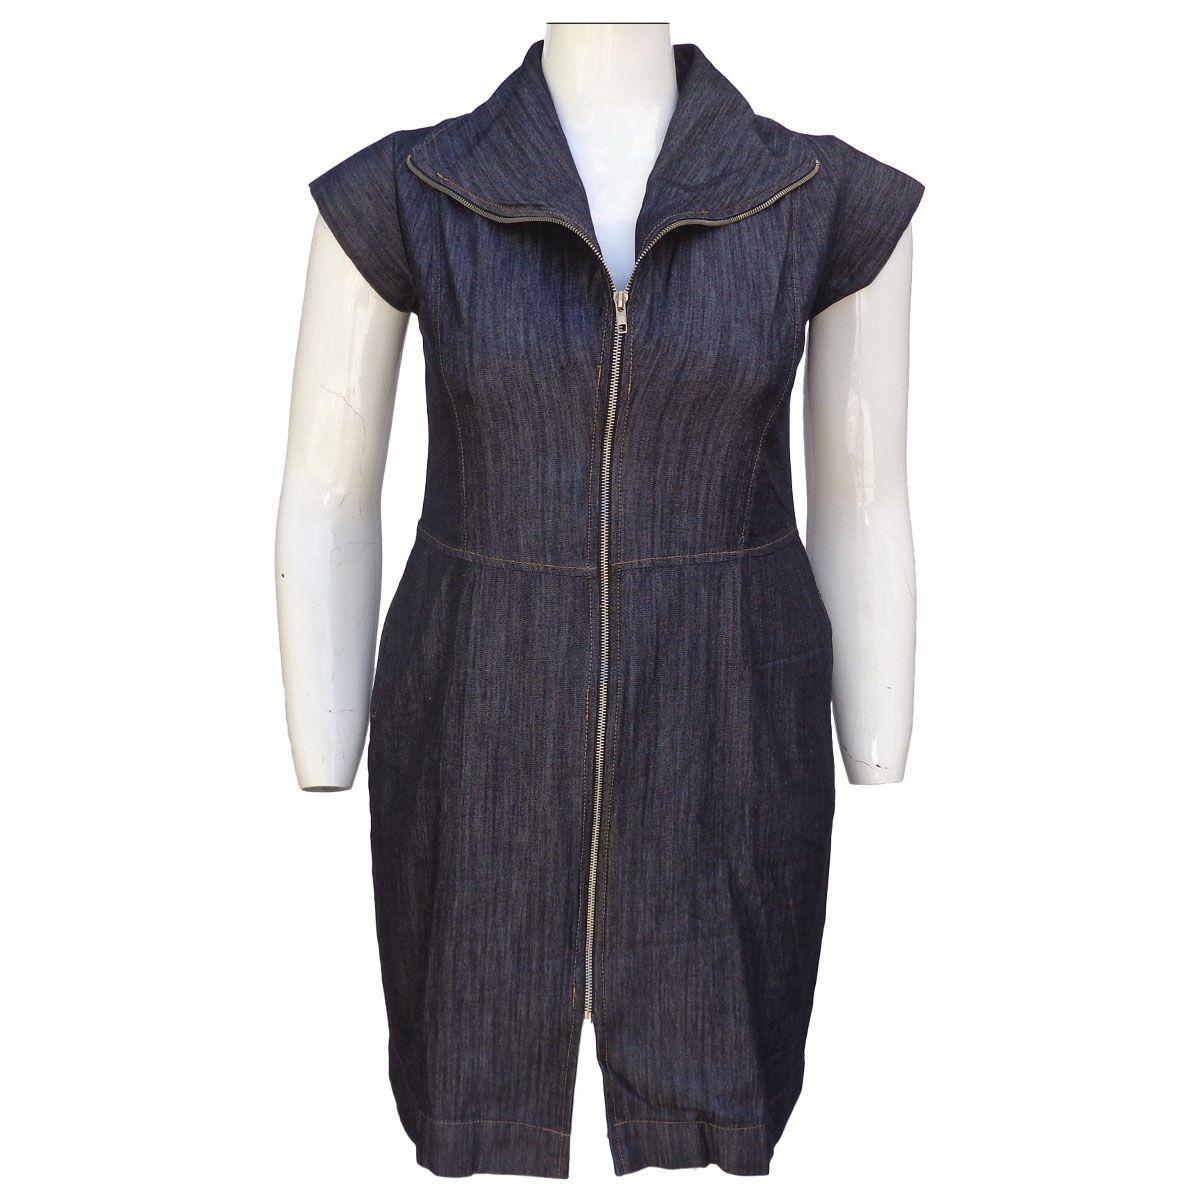 Vestido Jeans Evasê Plus Size Tamanho GG5